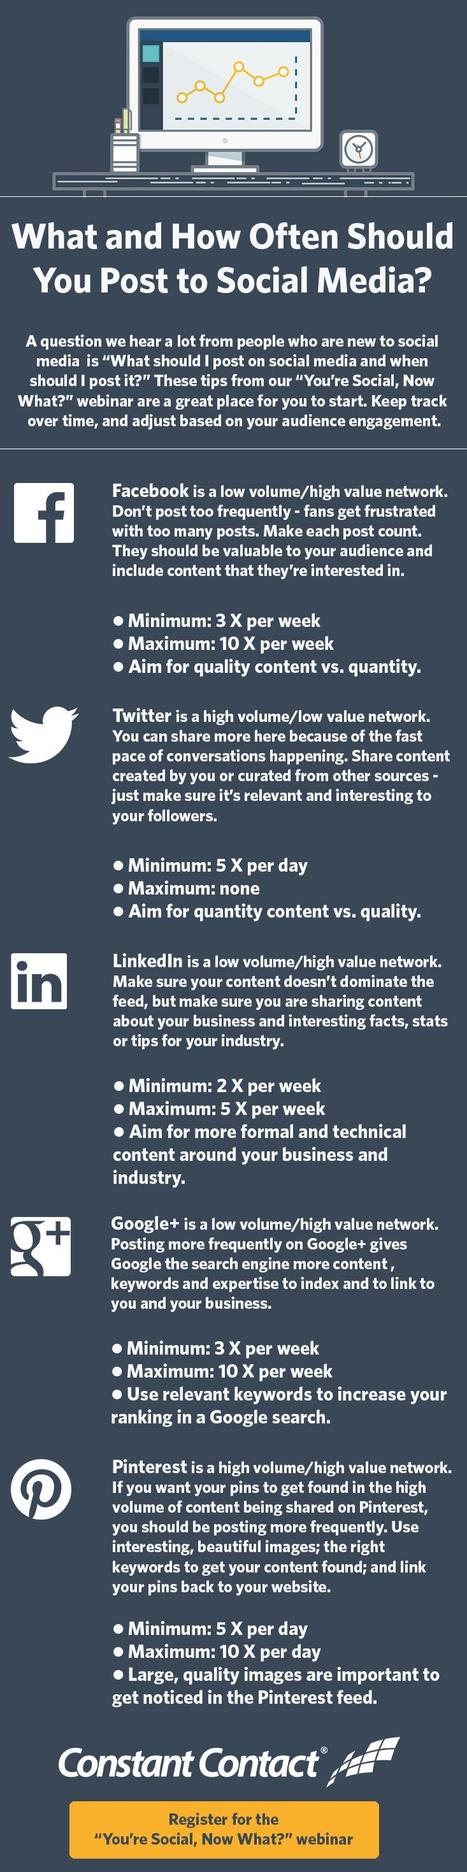 Digital Information World: How Often Should You Post to Facebook, Twitter, Pinterest, Google+ — Social Media #infographic | SocialMedia | Scoop.it